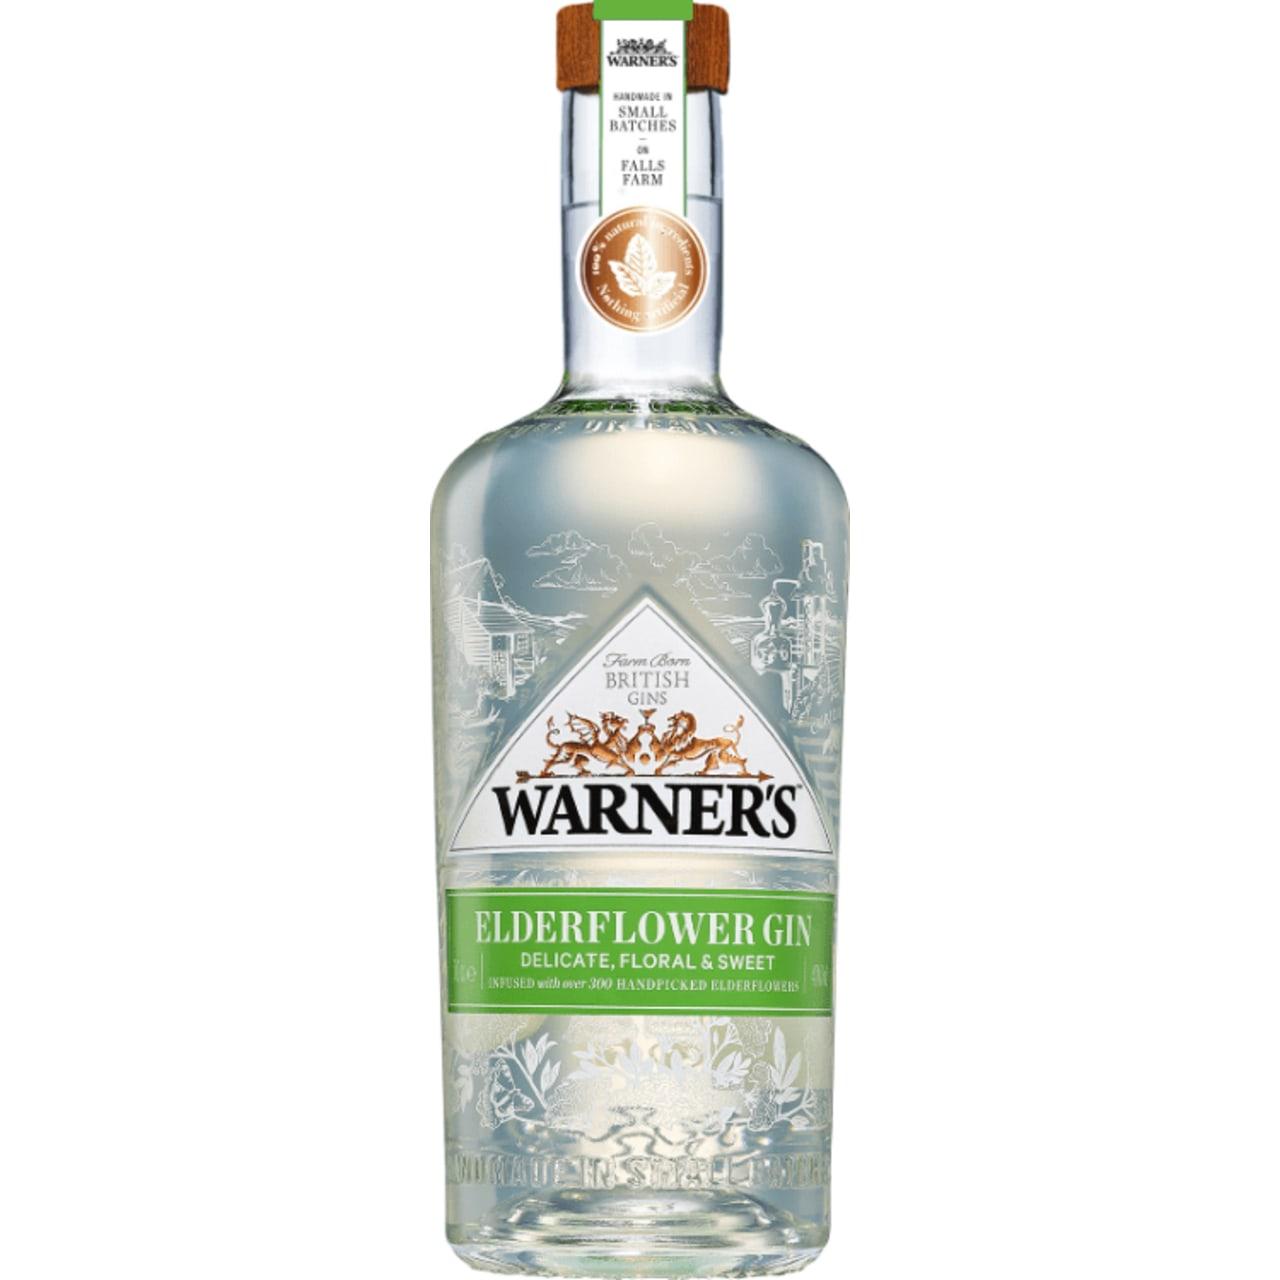 Warner's Elderflower Gin